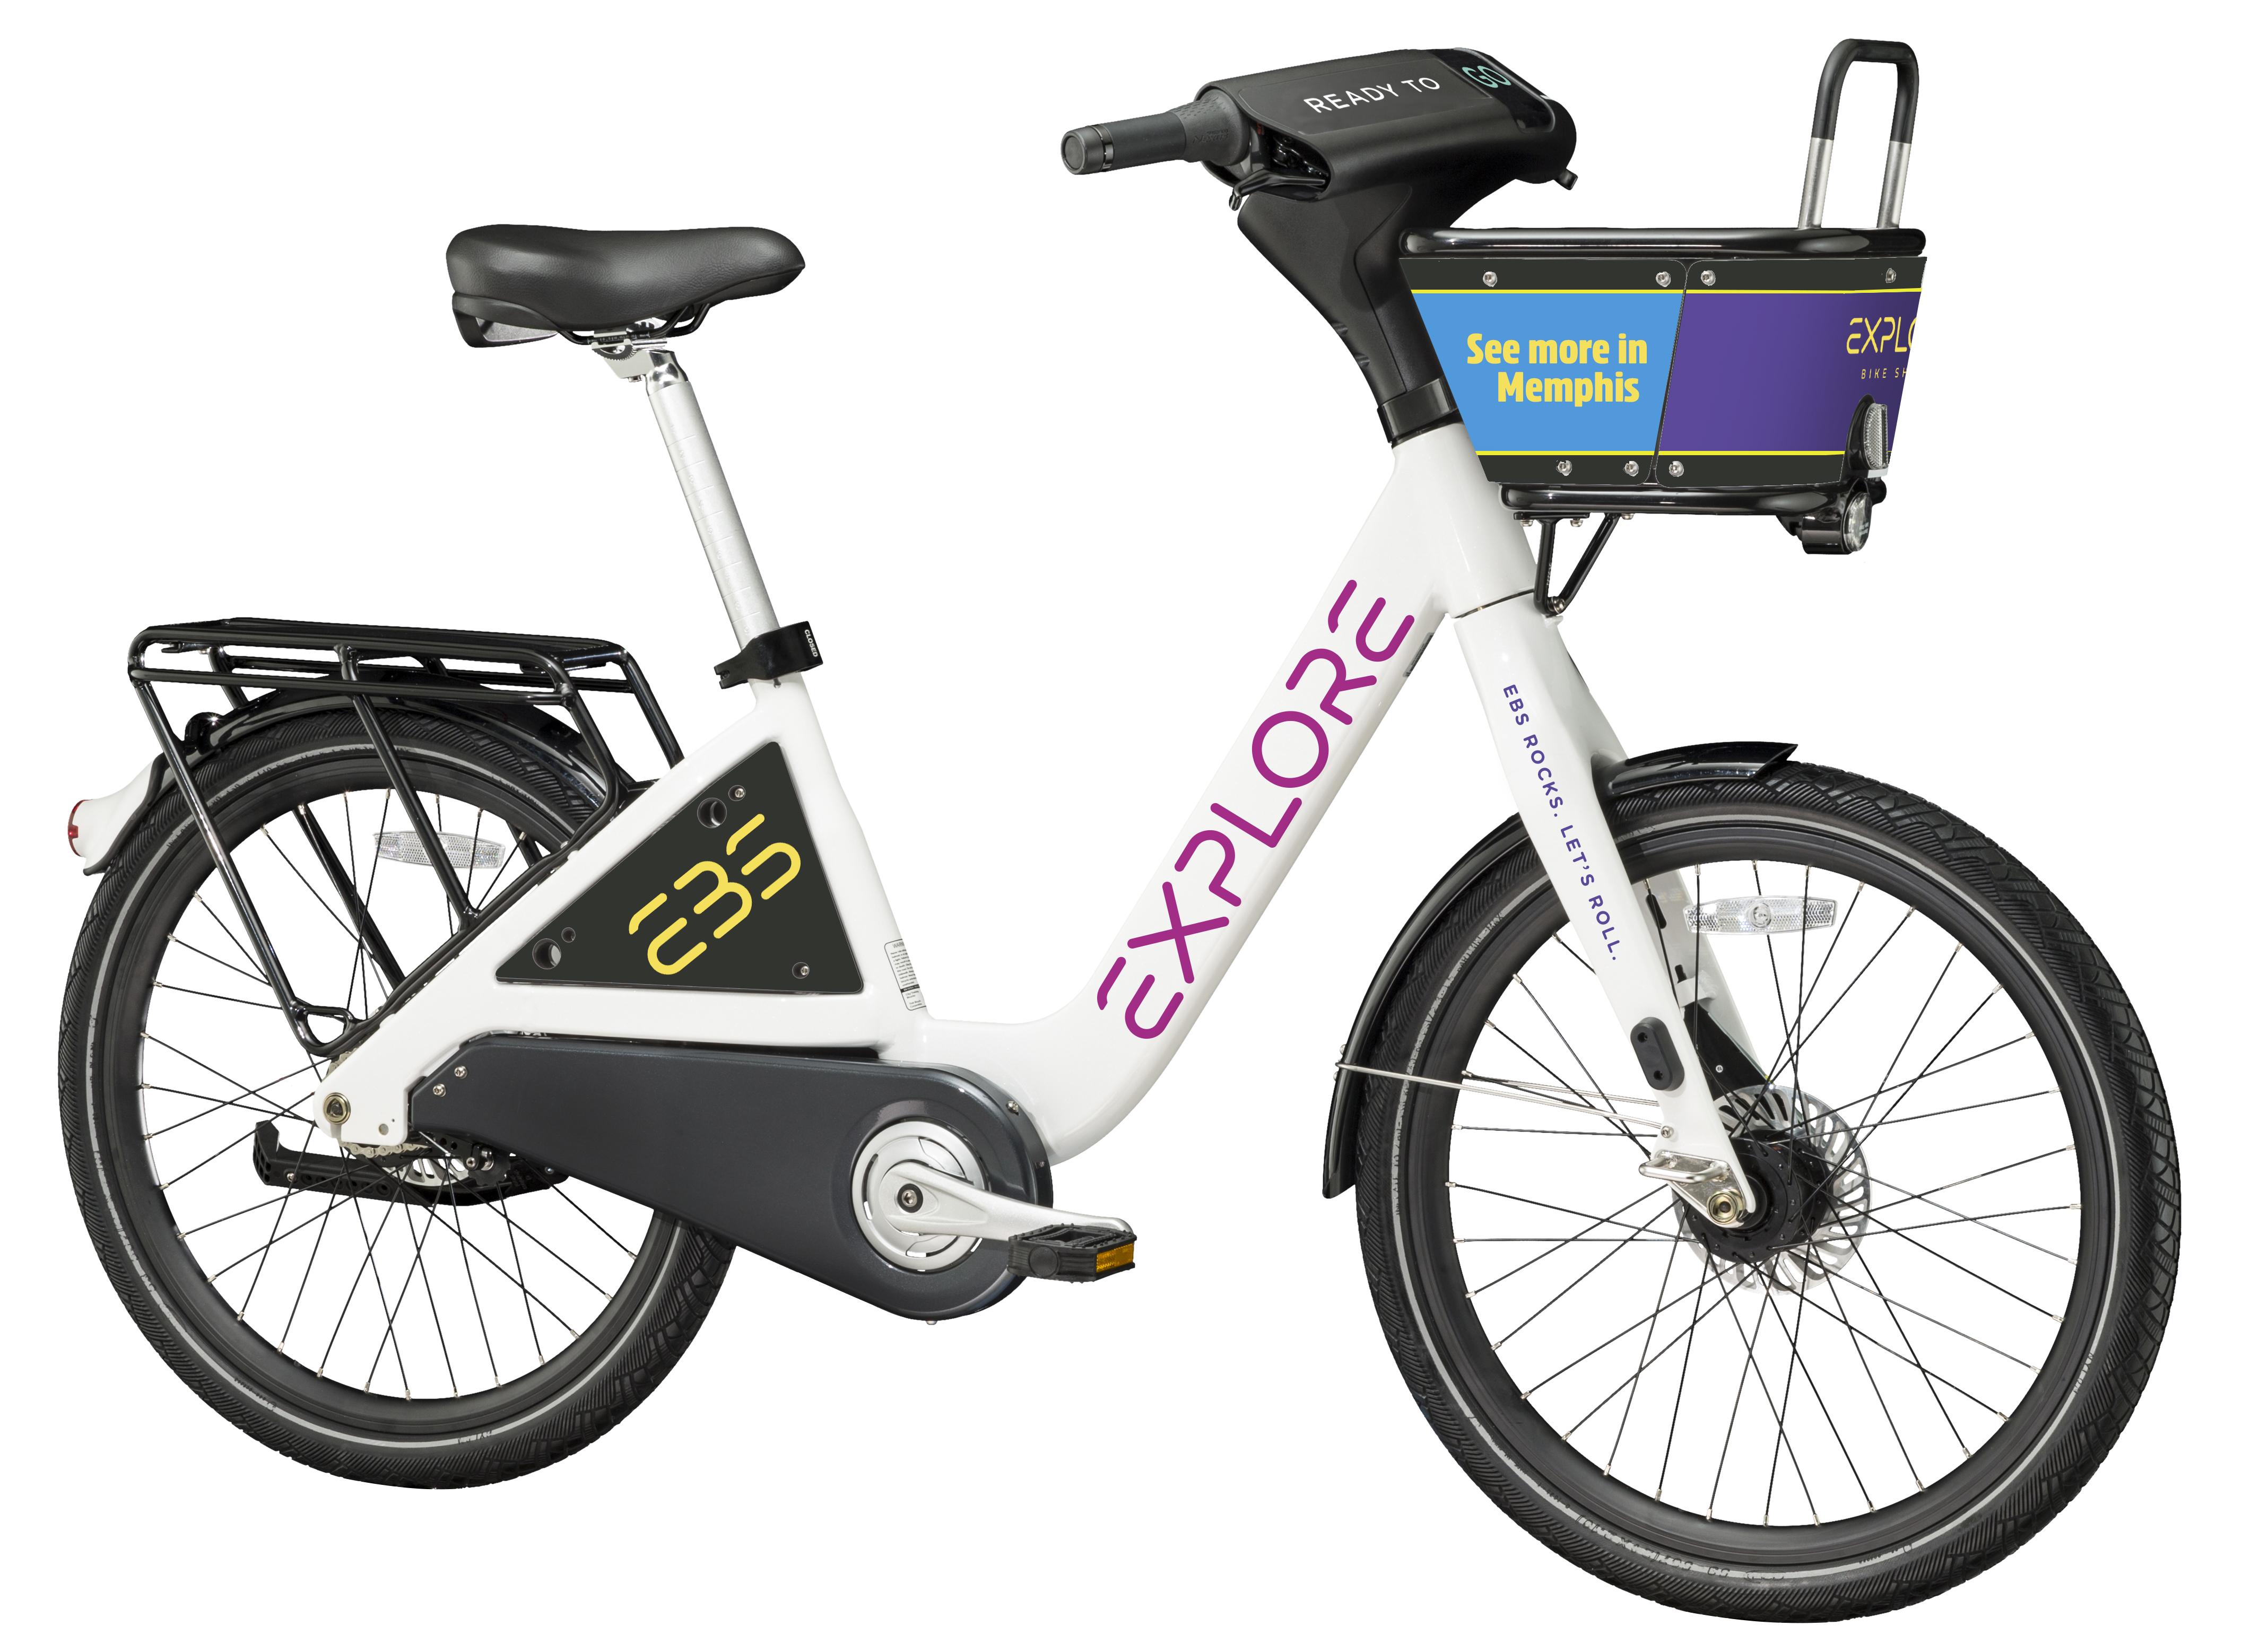 BikeDesign